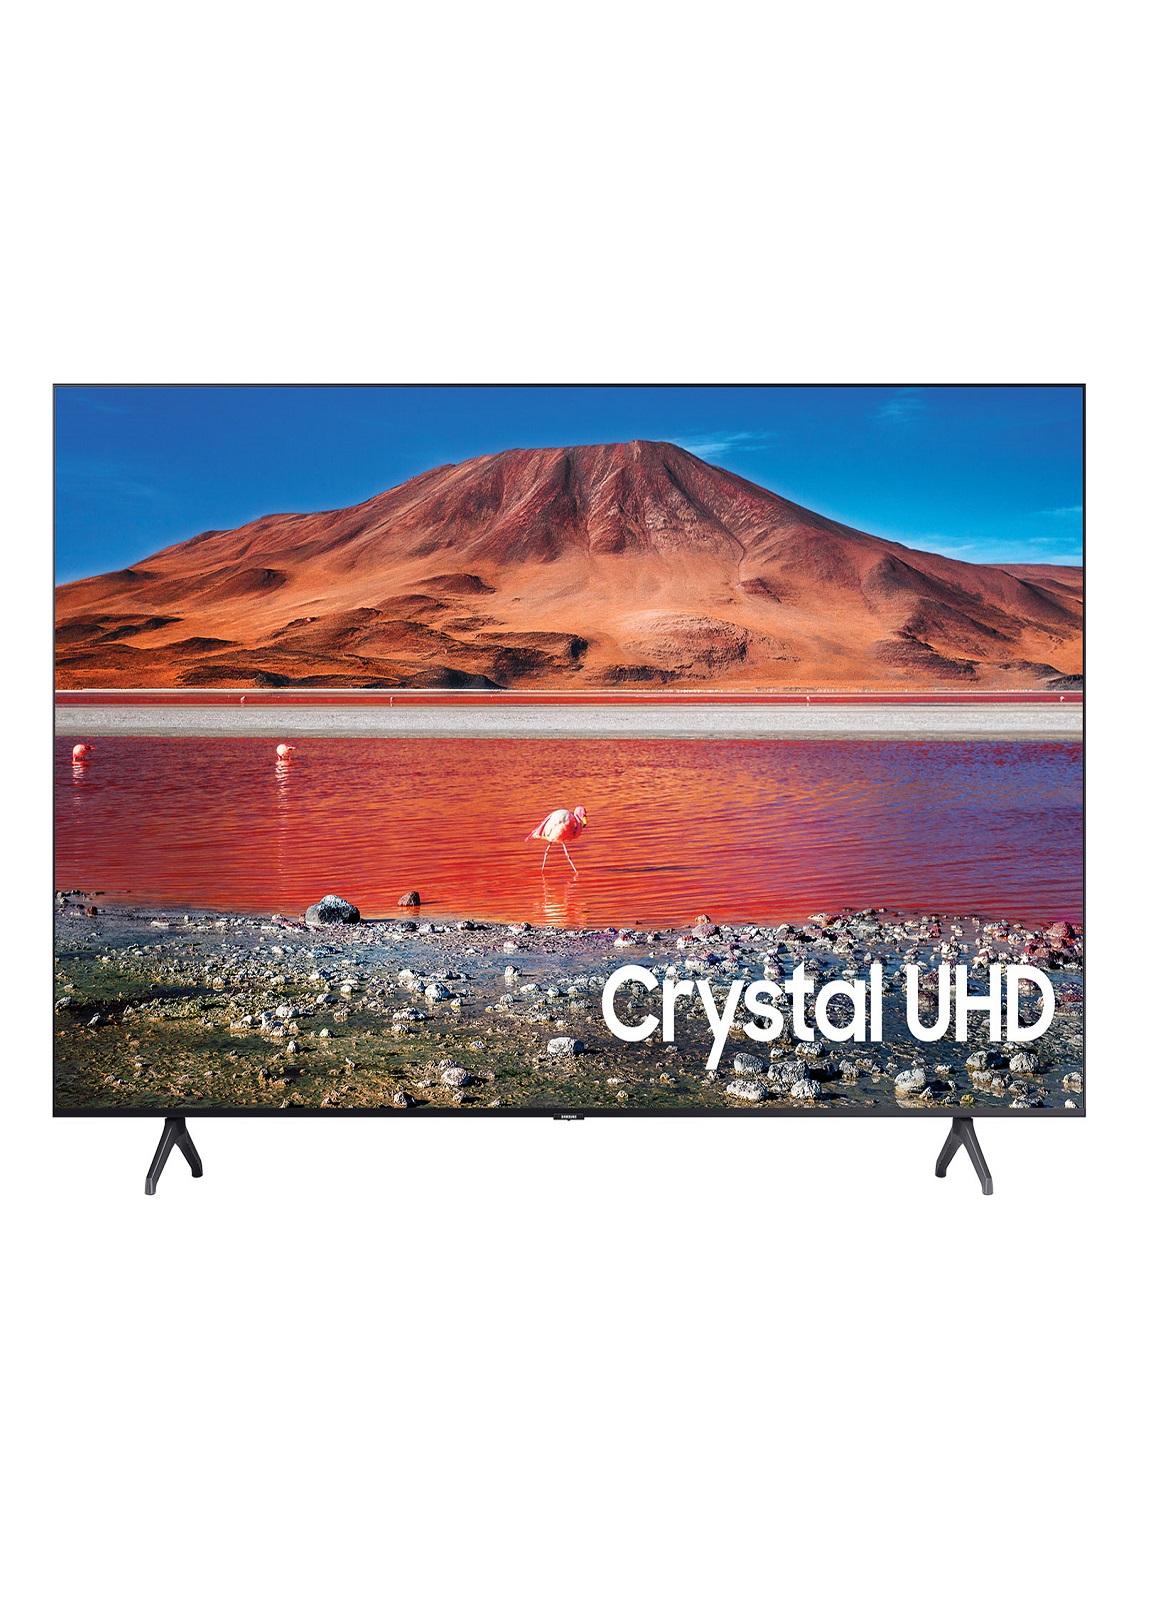 Samsung TU7000 Crystal UHD 4K Smart TV 58 شاشة تلفاز